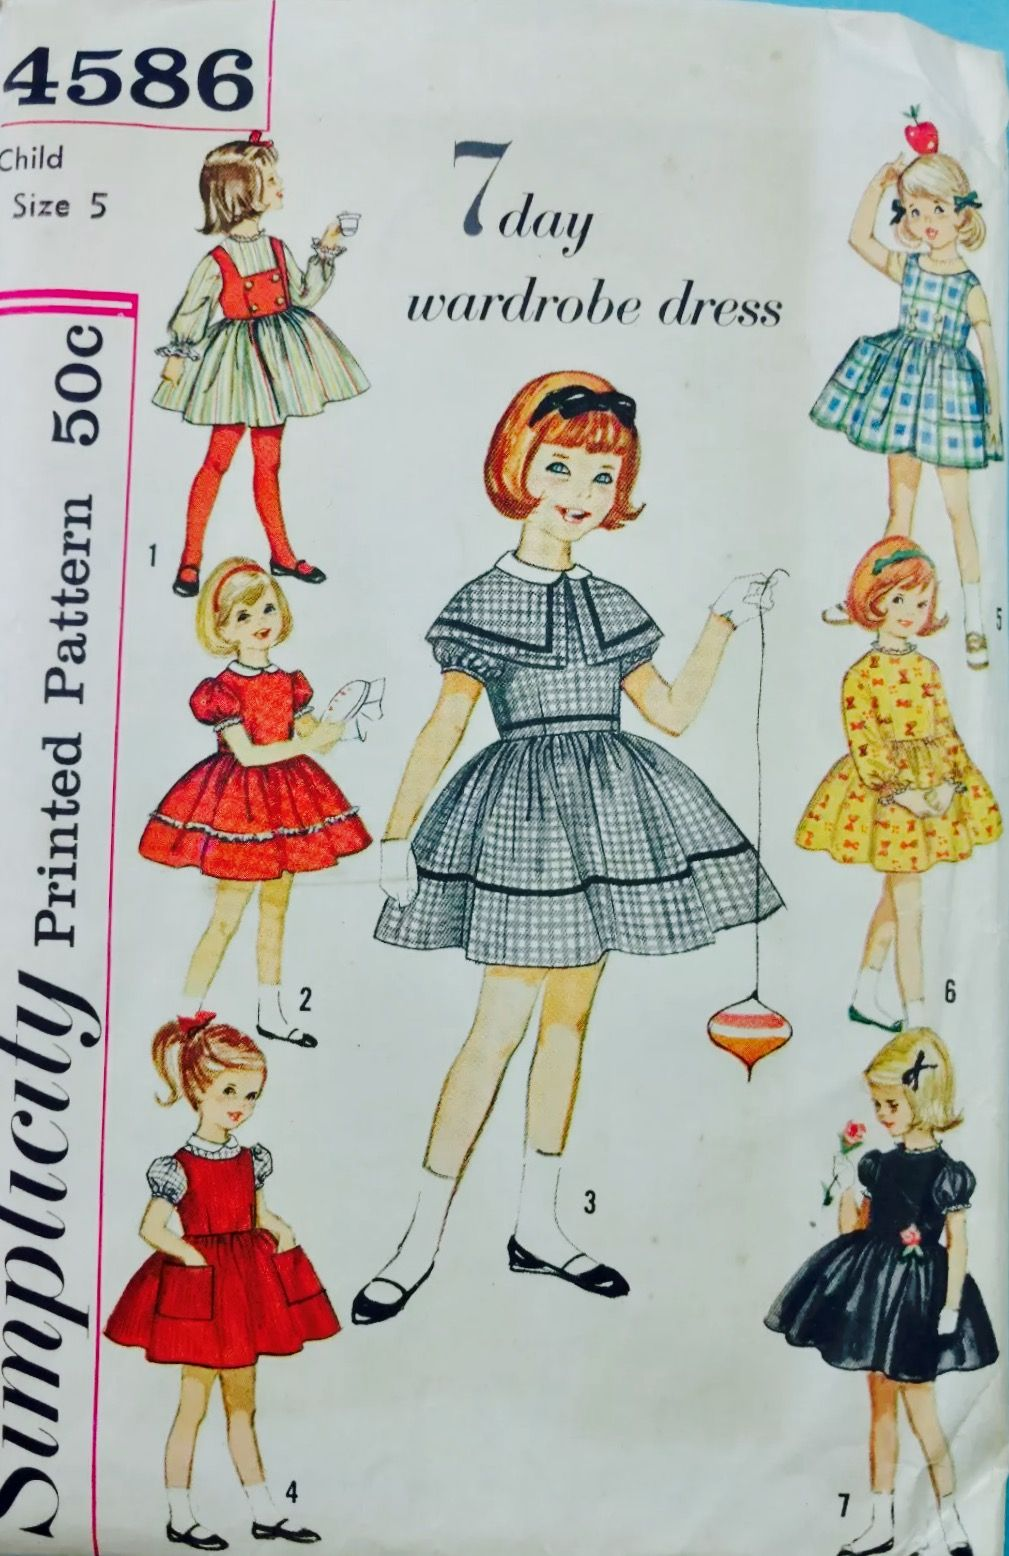 Vintage 1950/'s Sewing Pattern Alice in Wonderland Girls Dress Age 6 /& Doll Dress